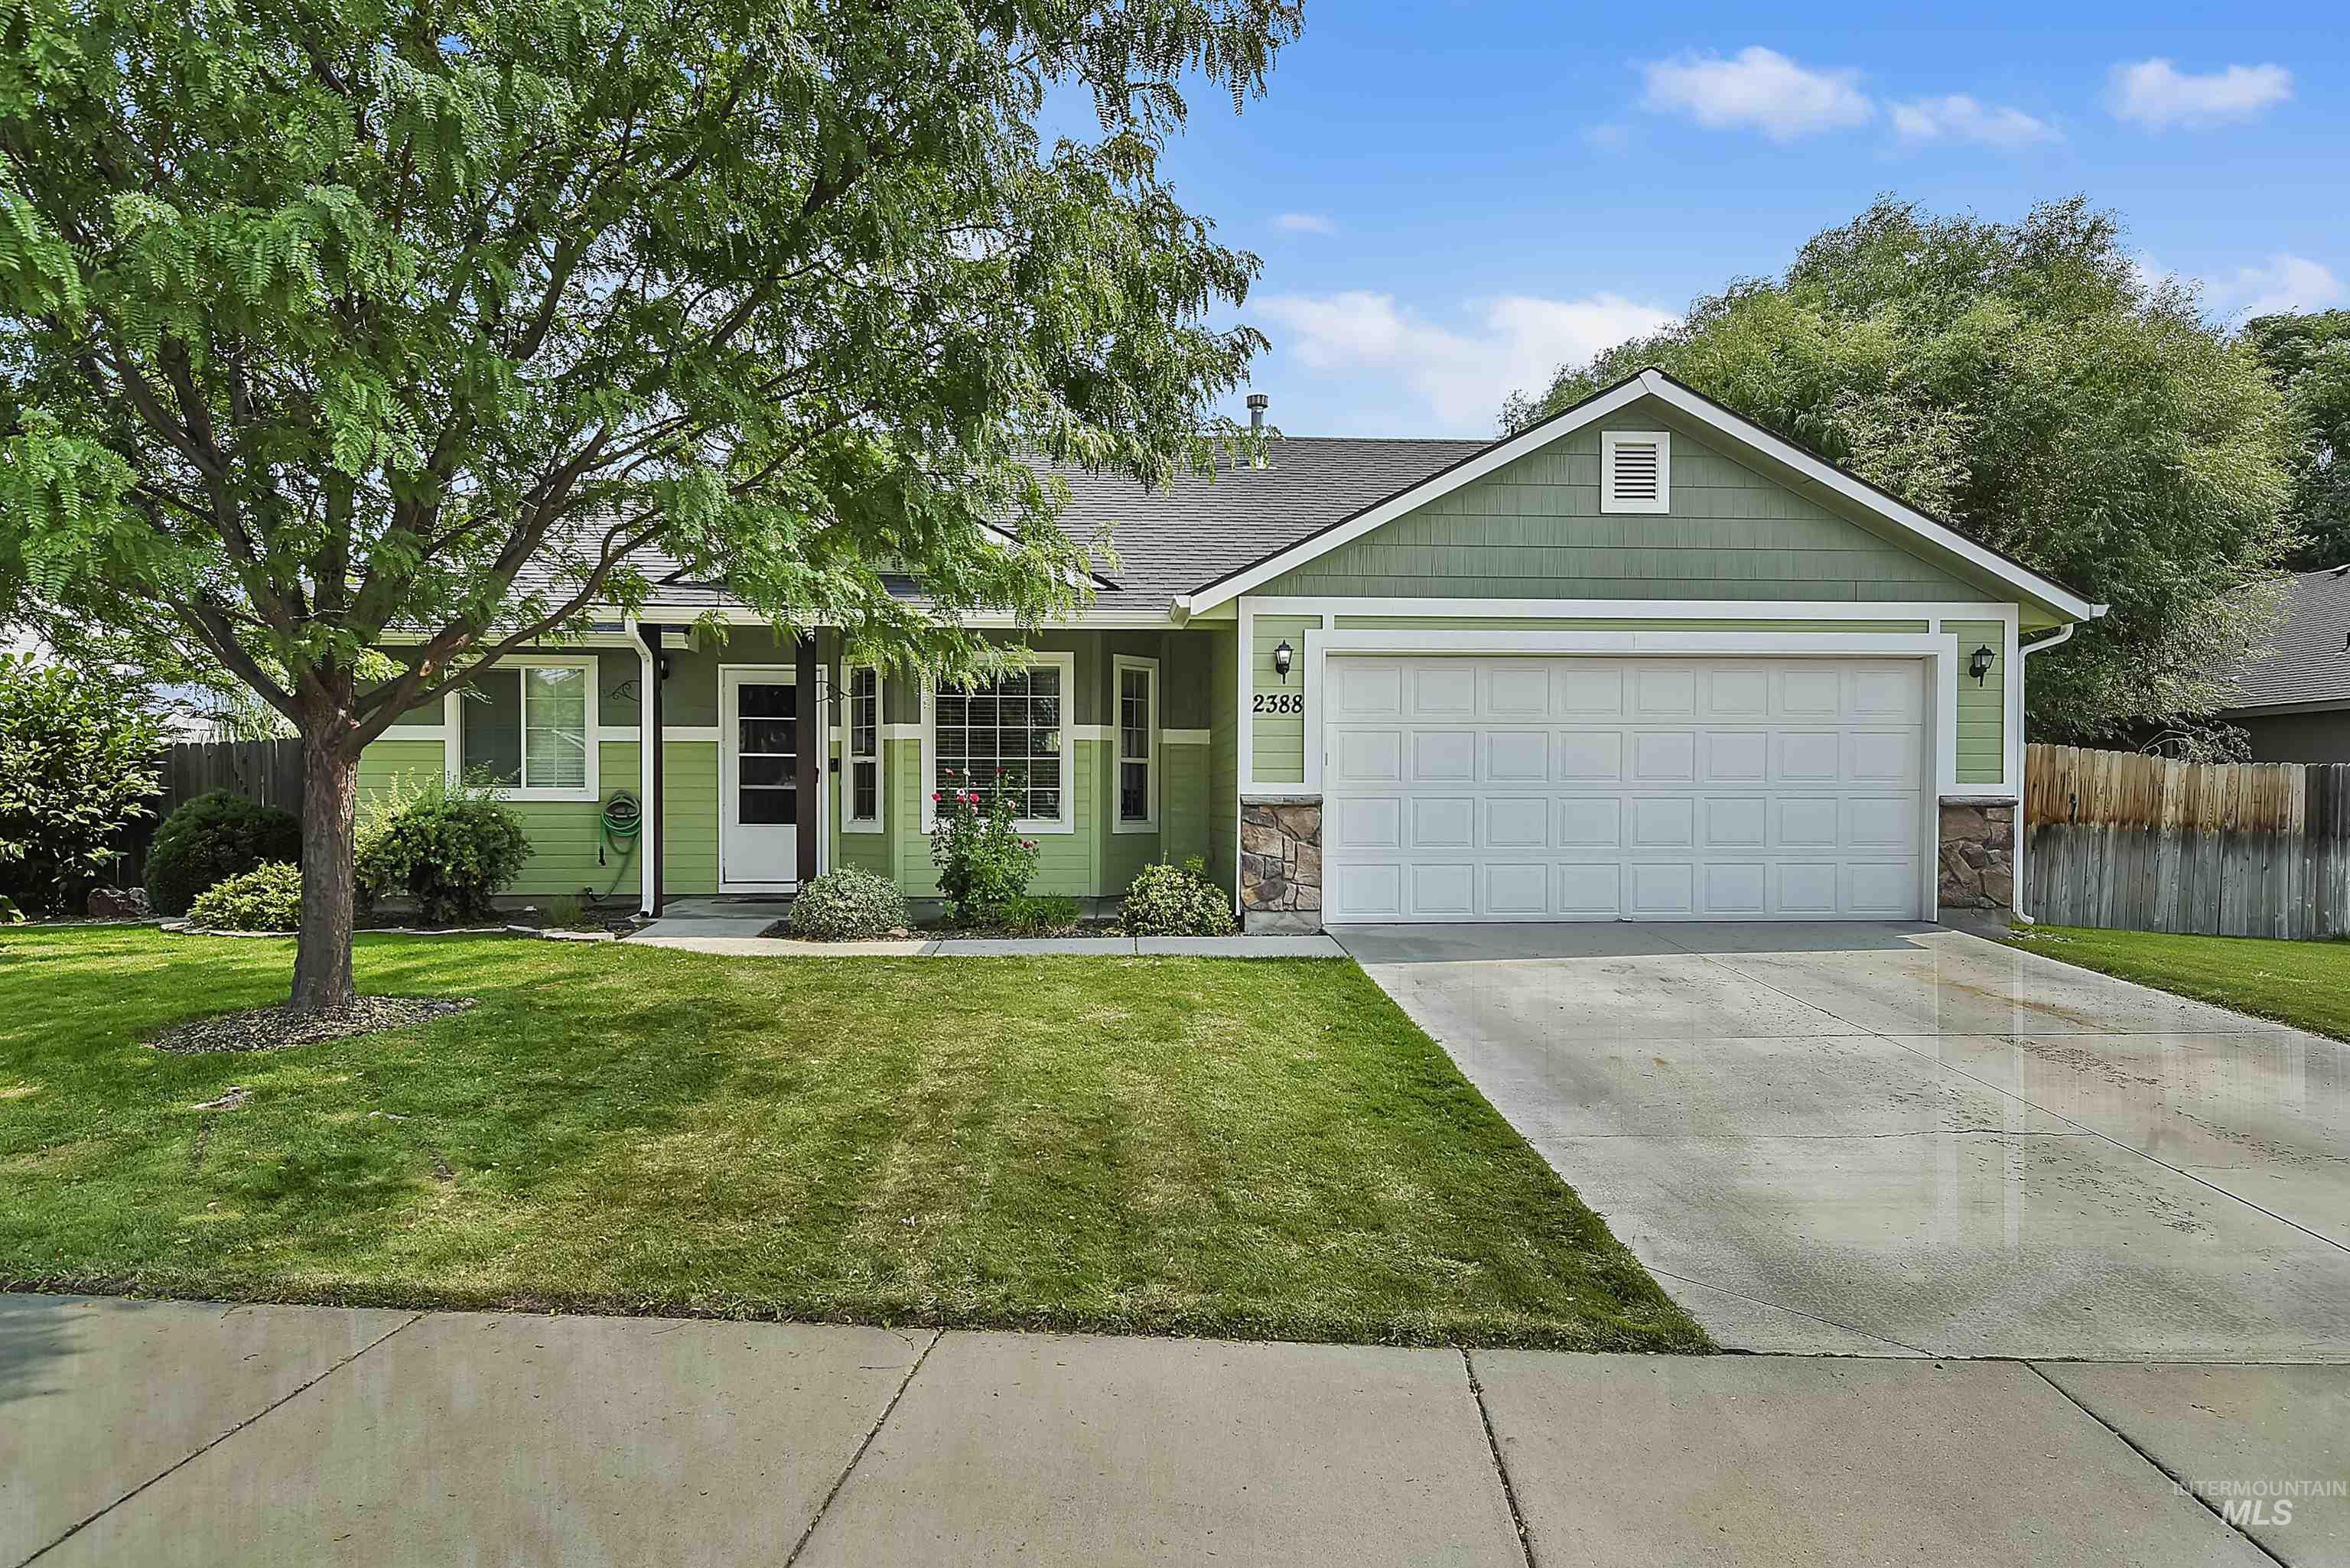 2388 N Mountain Ash Ave Property Photo